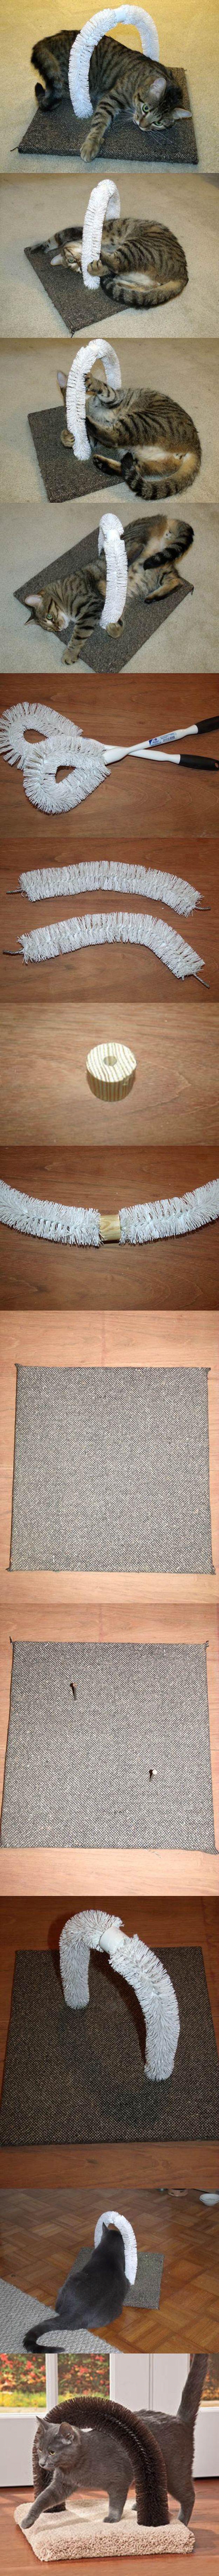 DIY fácil Proyecto para gatos | http://artesaniasdebricolaje.ru/best-diy-pet-projects-to-keep-your-furry-friends-happy/